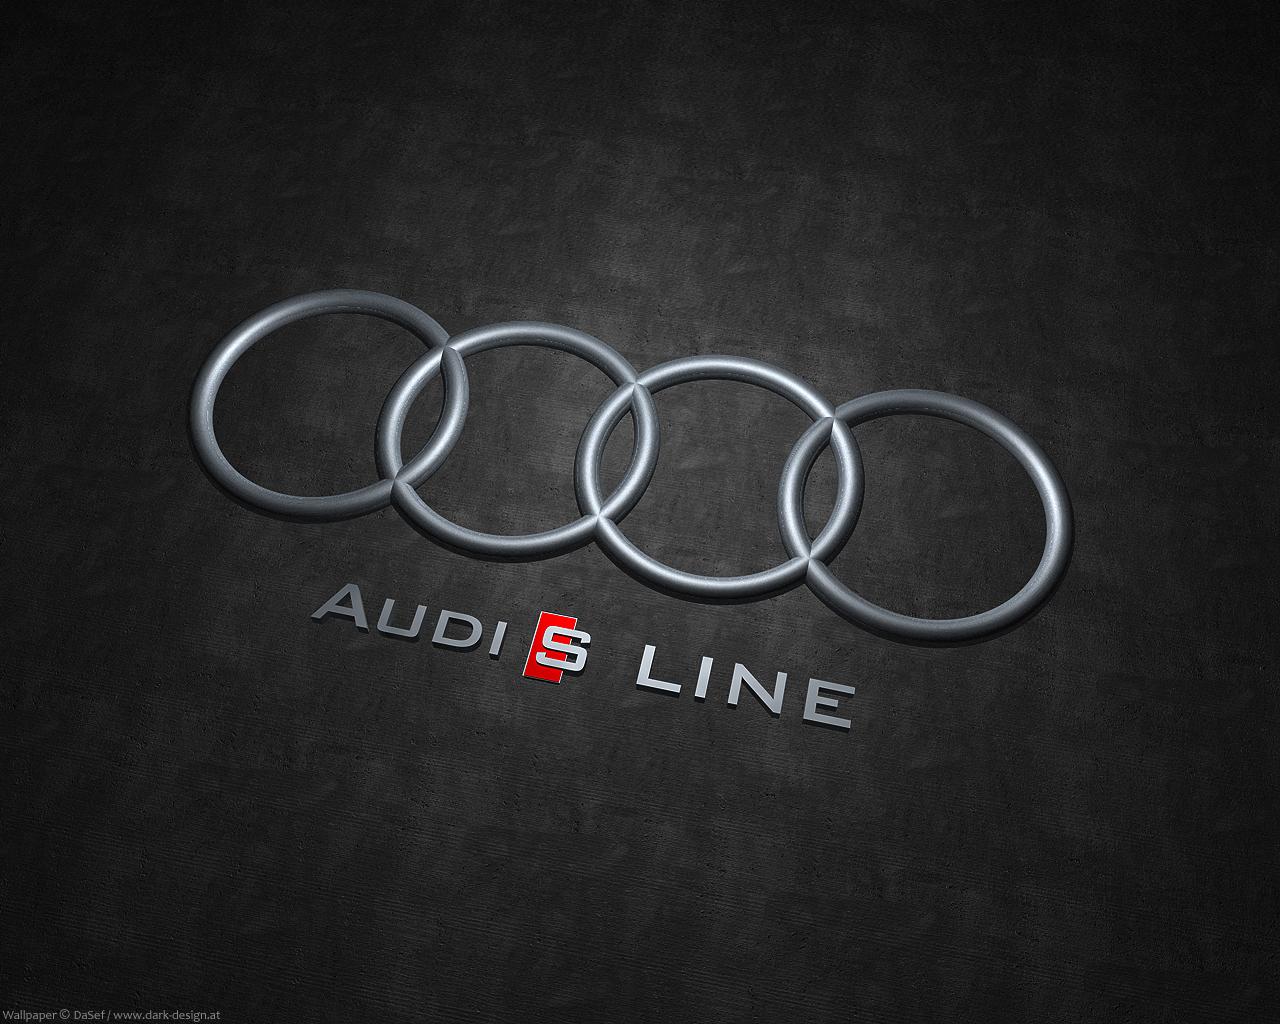 audi s line logos